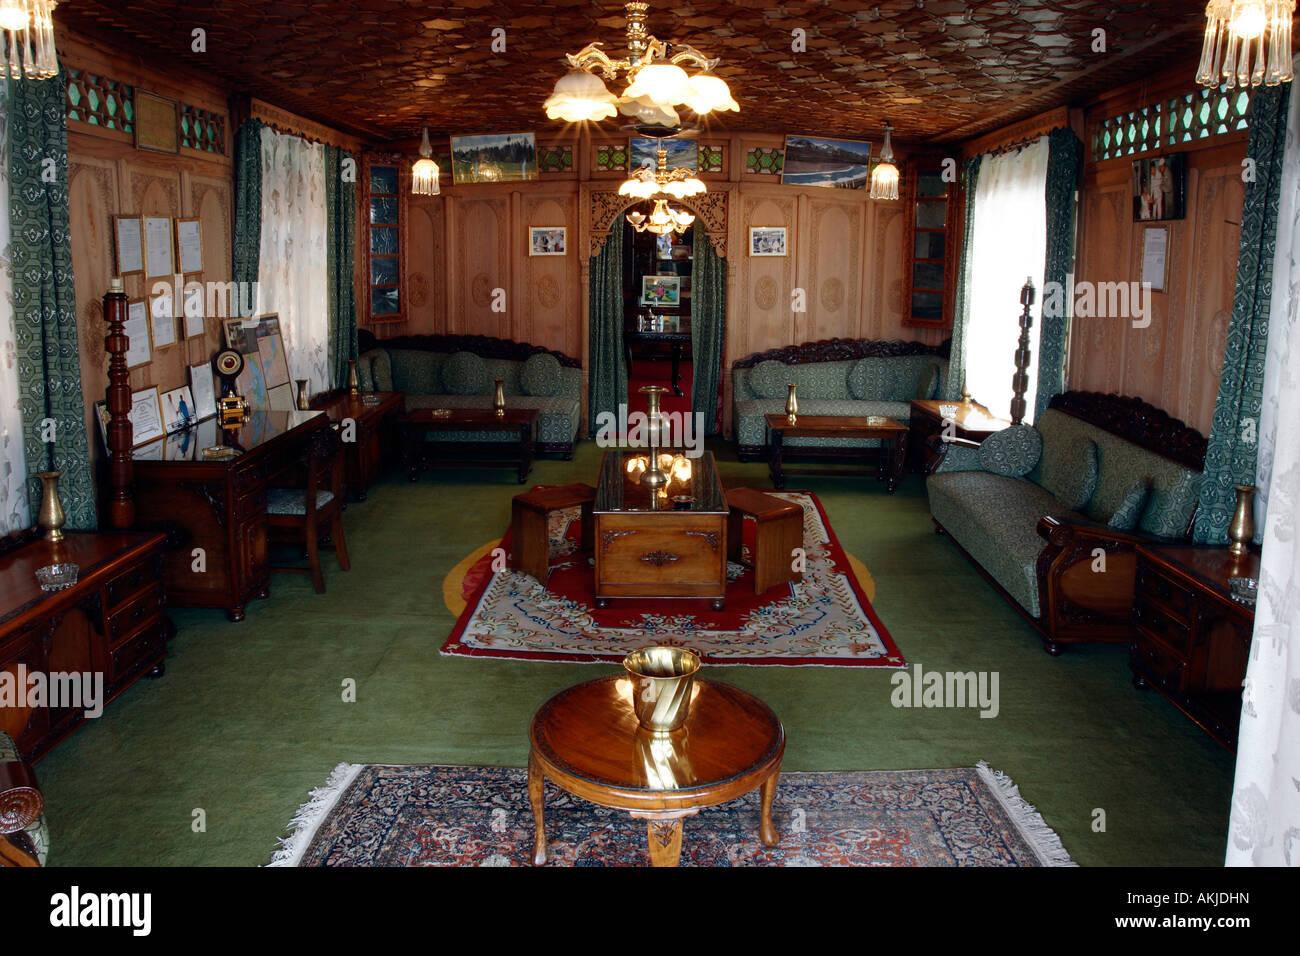 Merveilleux India, Jammu And Kashmir, Srinagar, On The Lake Dal, Livingroom Of A